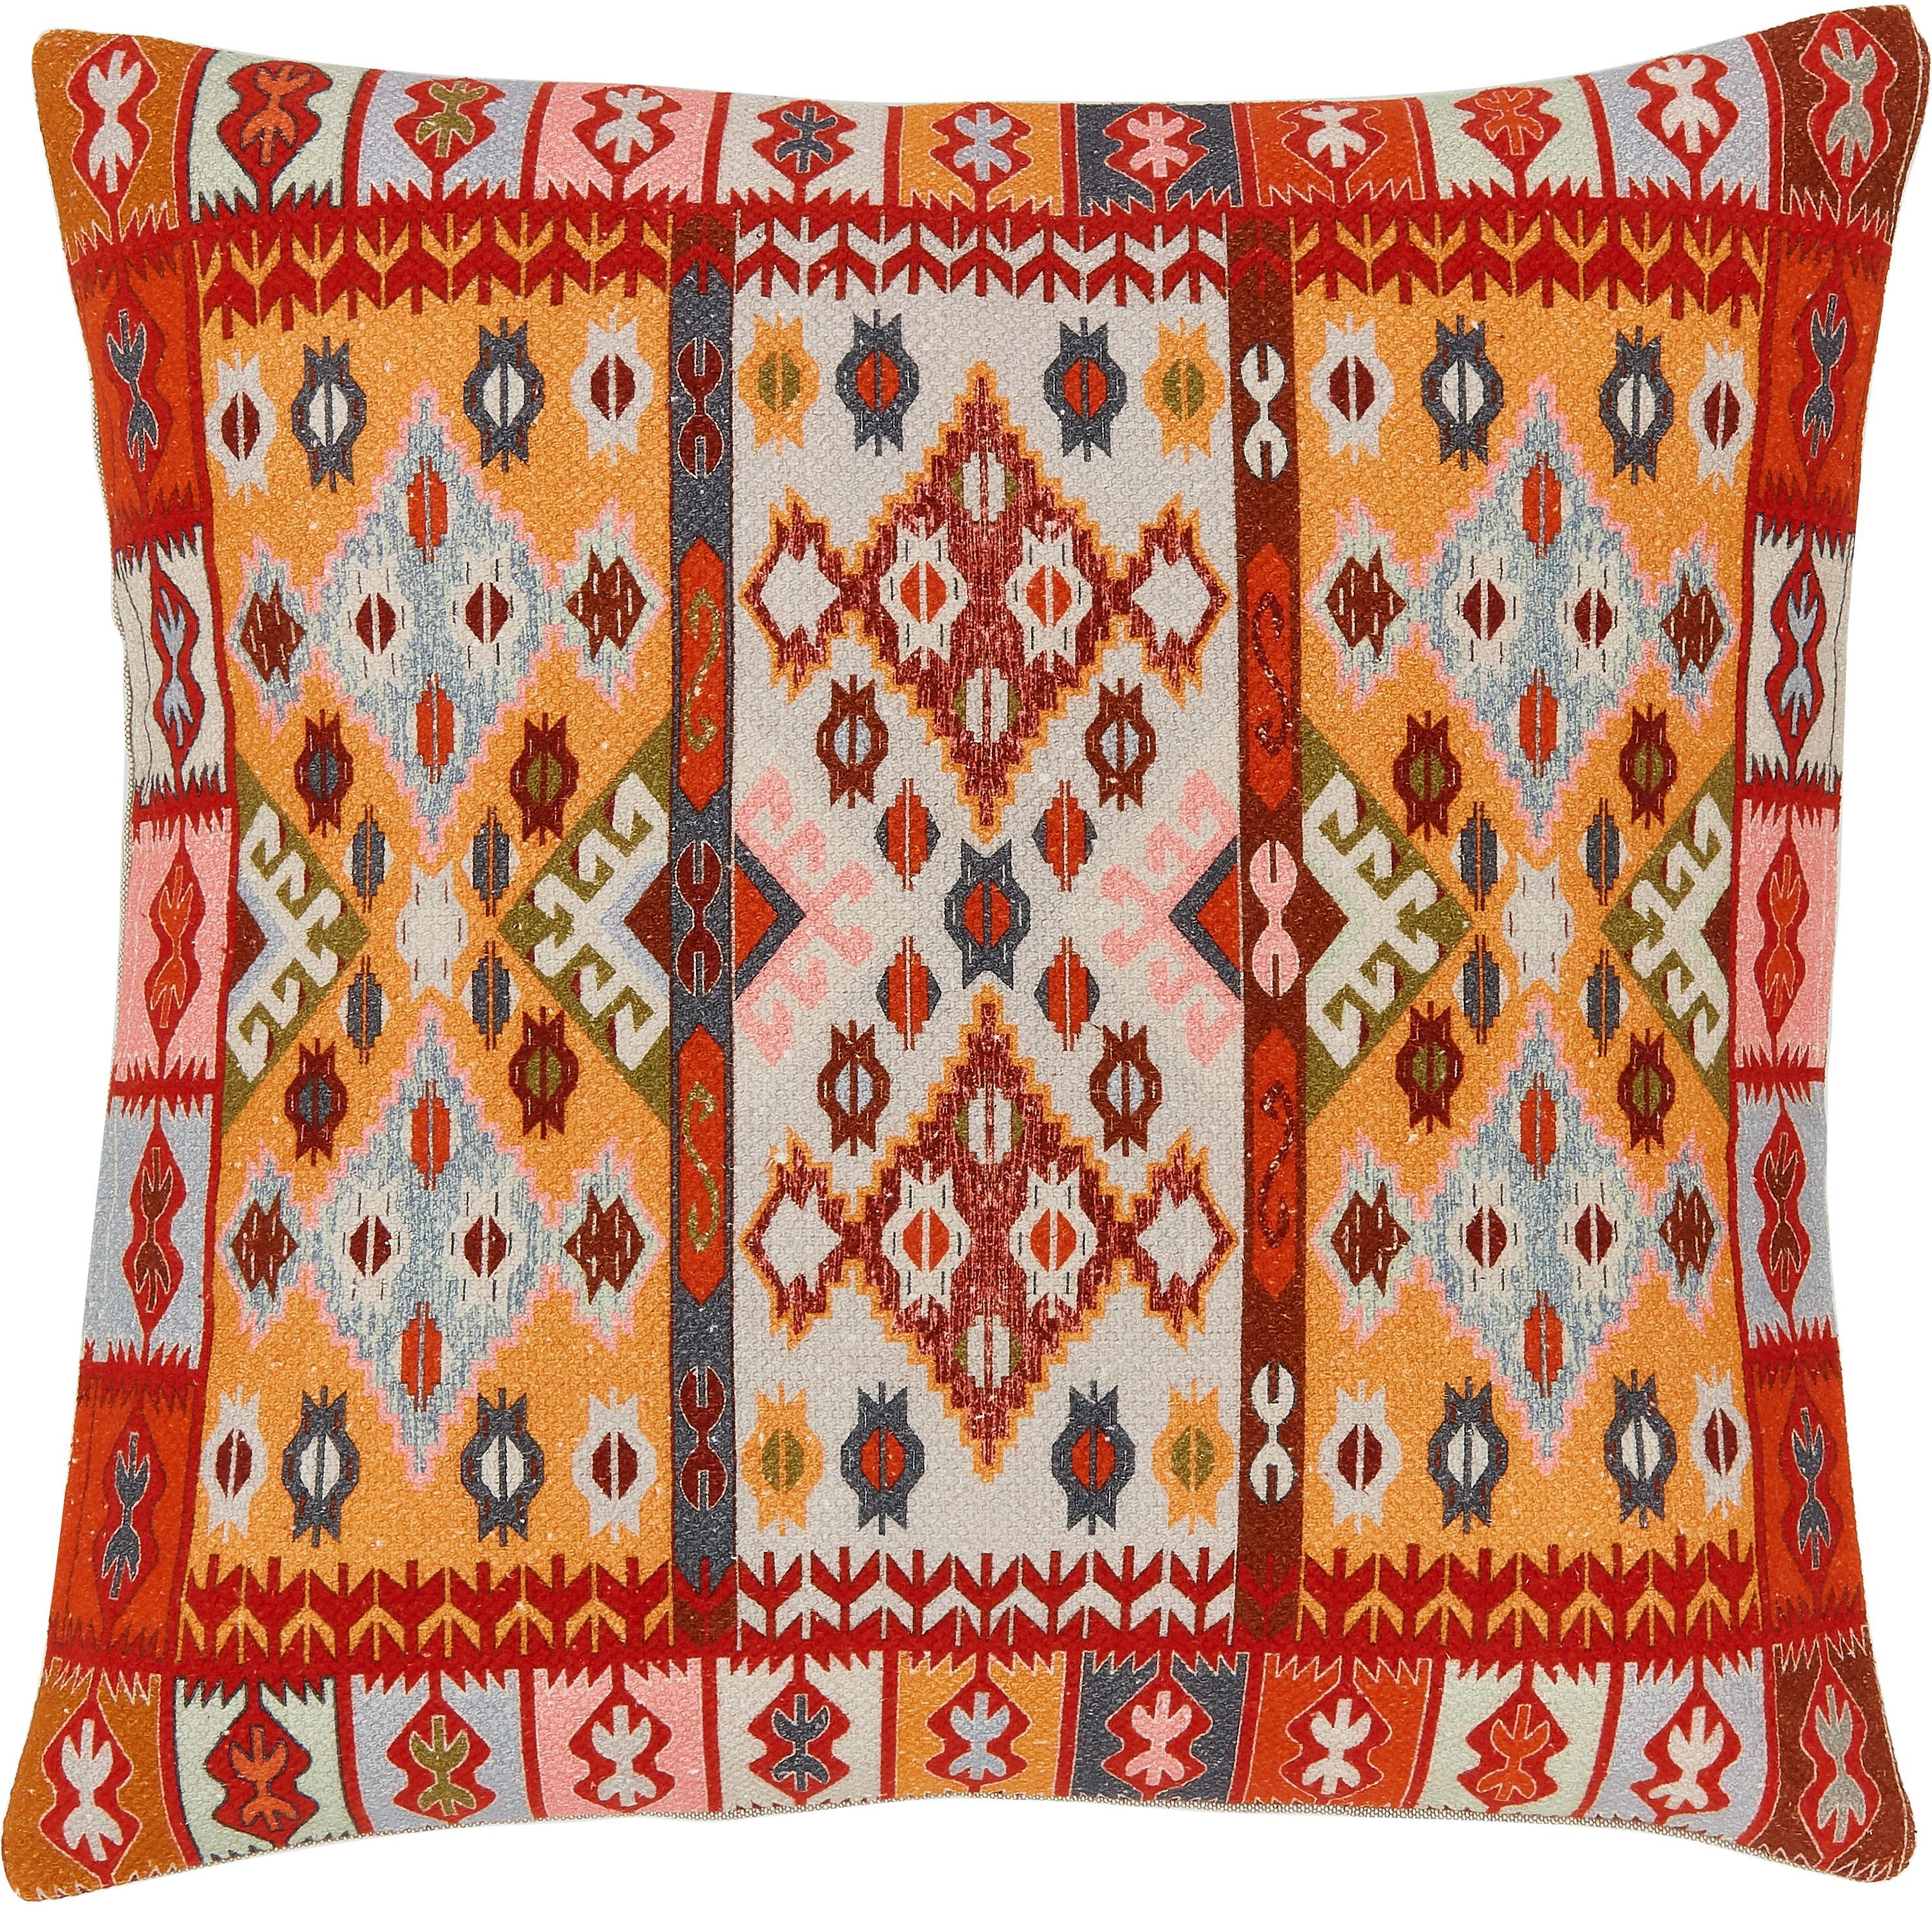 Ethno kussenhoes Budak, 100% katoen, Multicolour, 45 x 45 cm